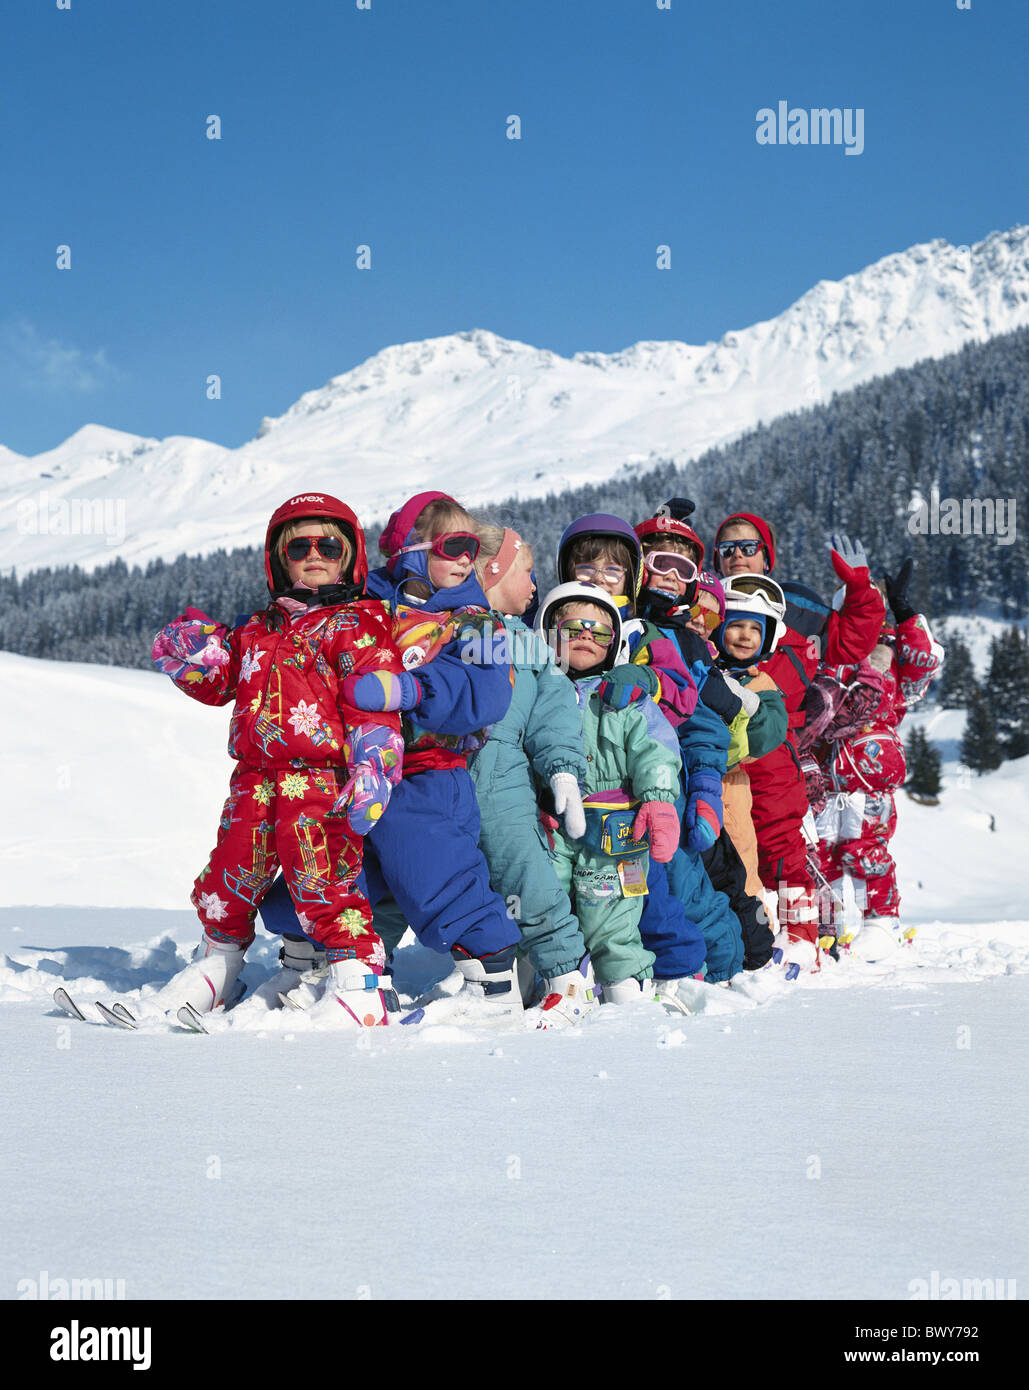 helmets one after other canton Graubunden Grisons Switzerland Europe children row Switzerland Europe skii - Stock Image